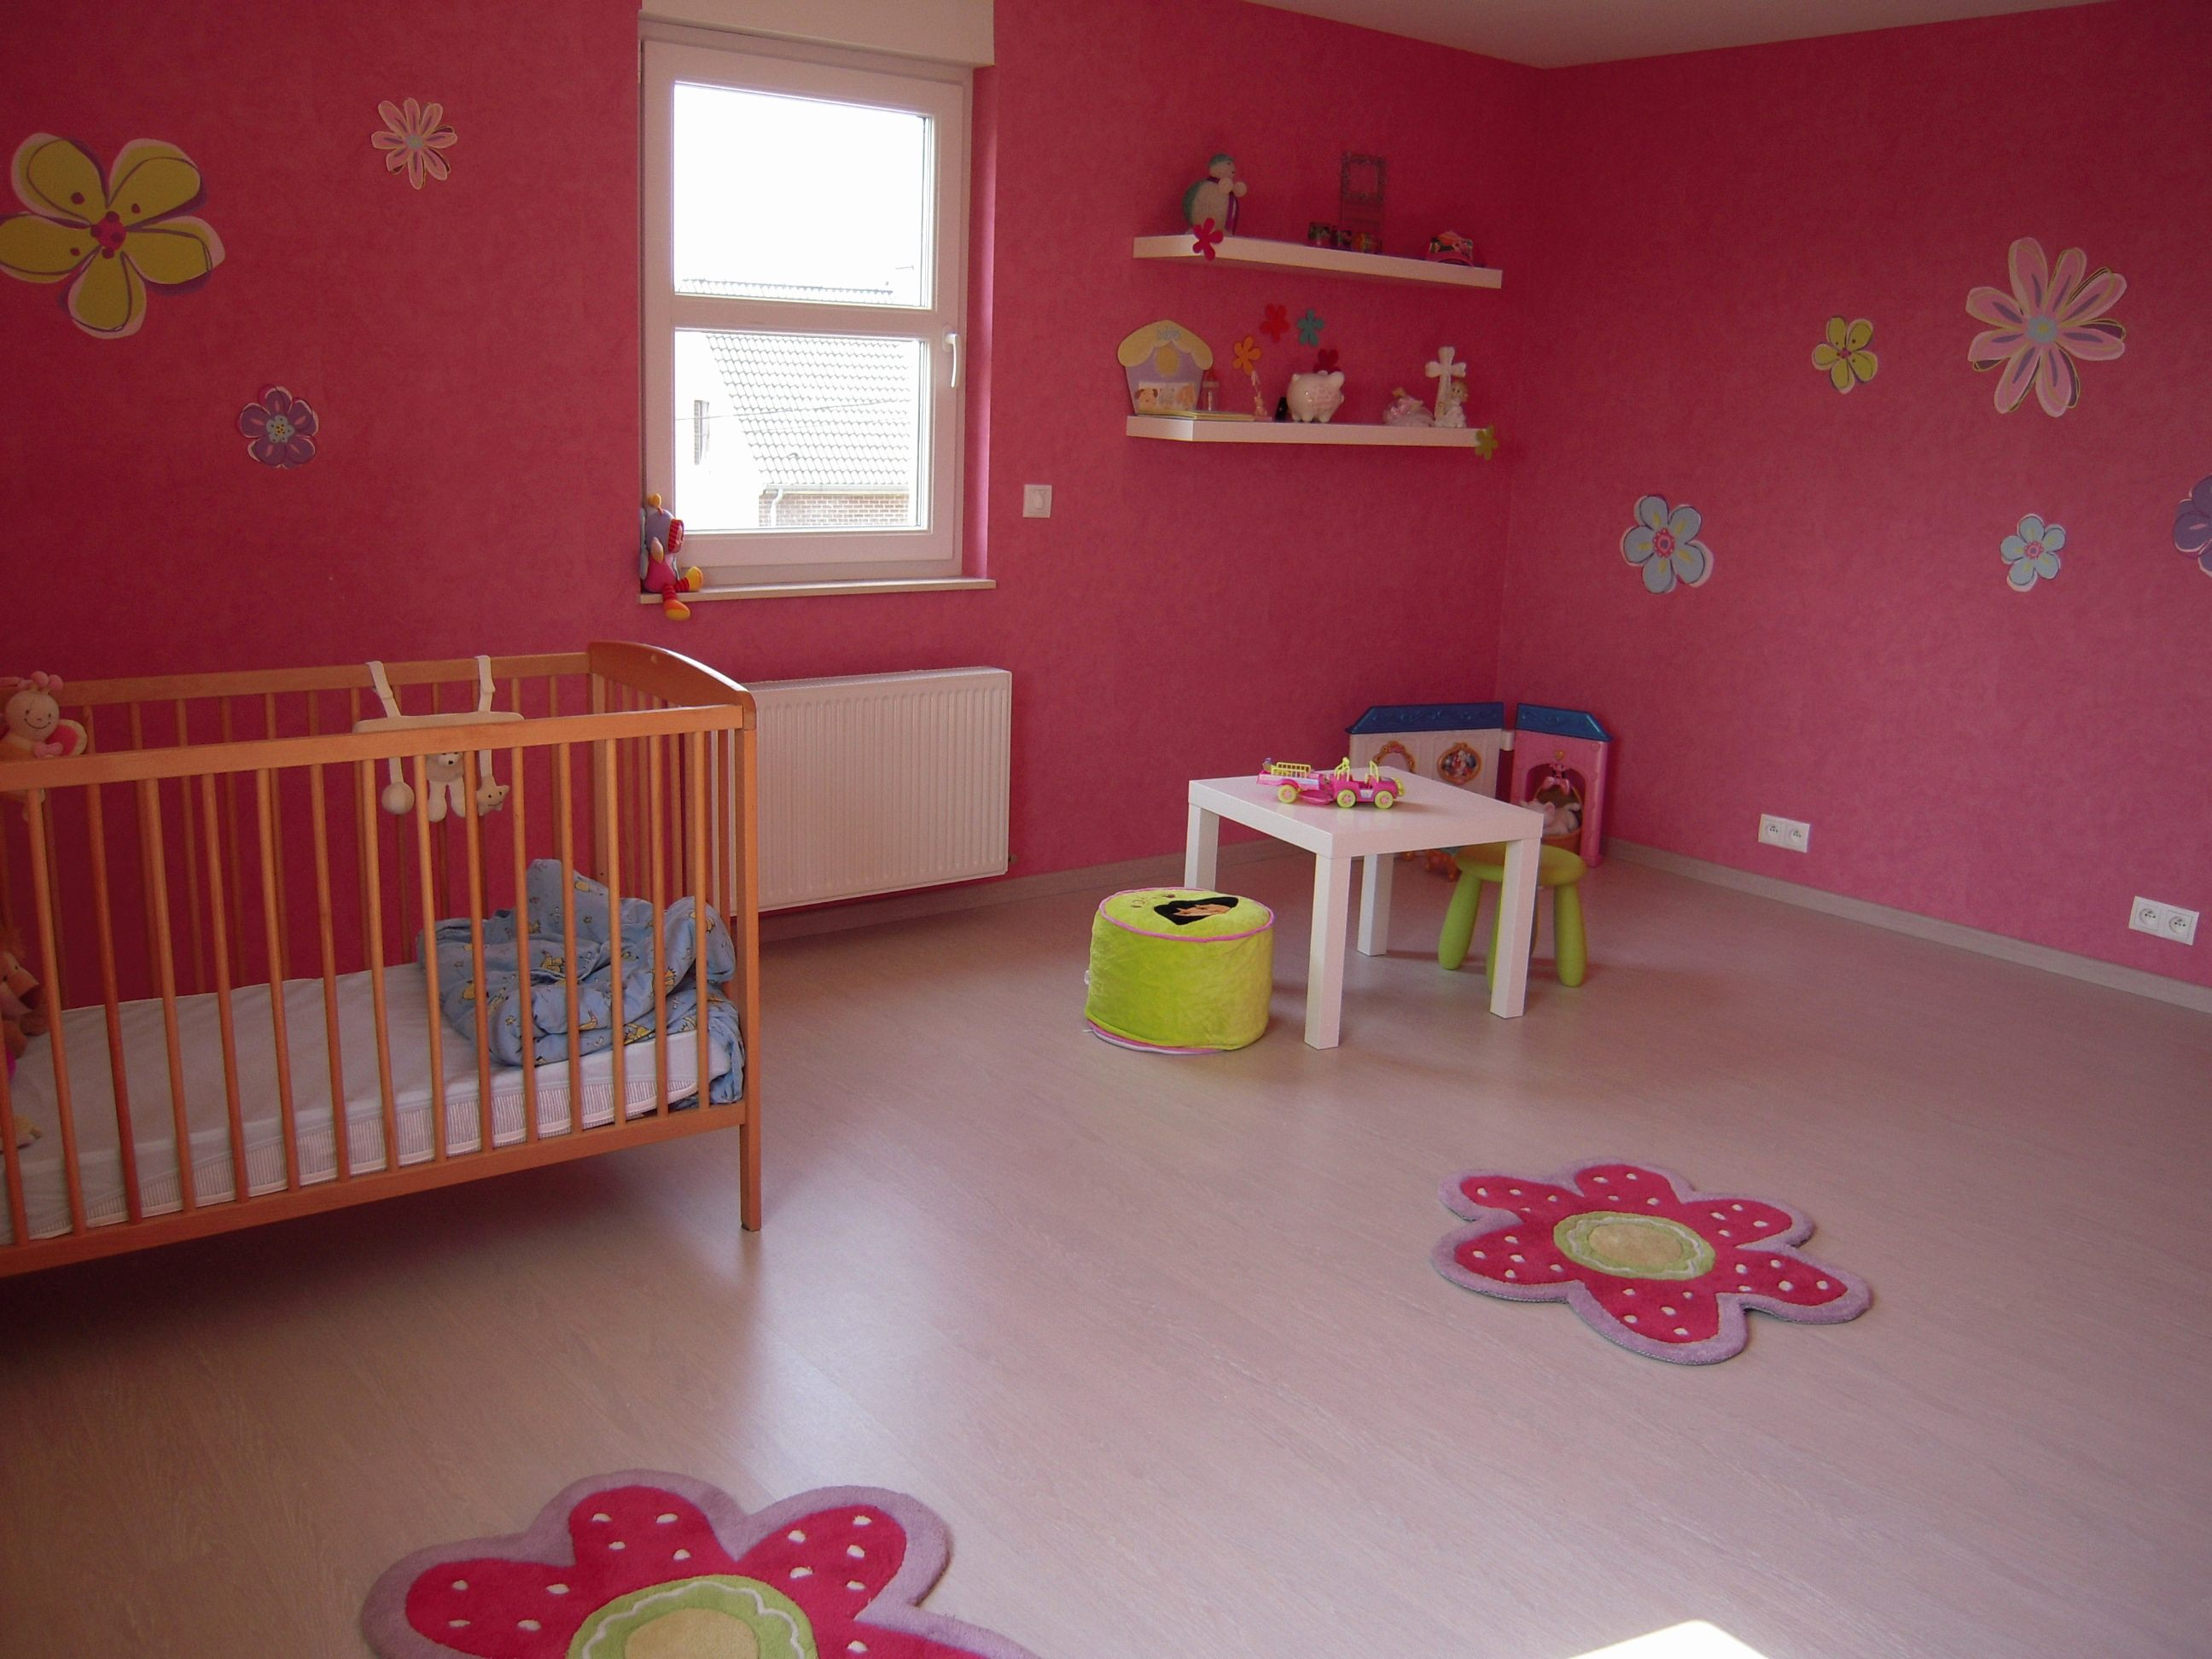 Lit Chambre Enfant Bel Ma Chambre Enfant Inspirant Banquette Enfant Best Banquette Chambre